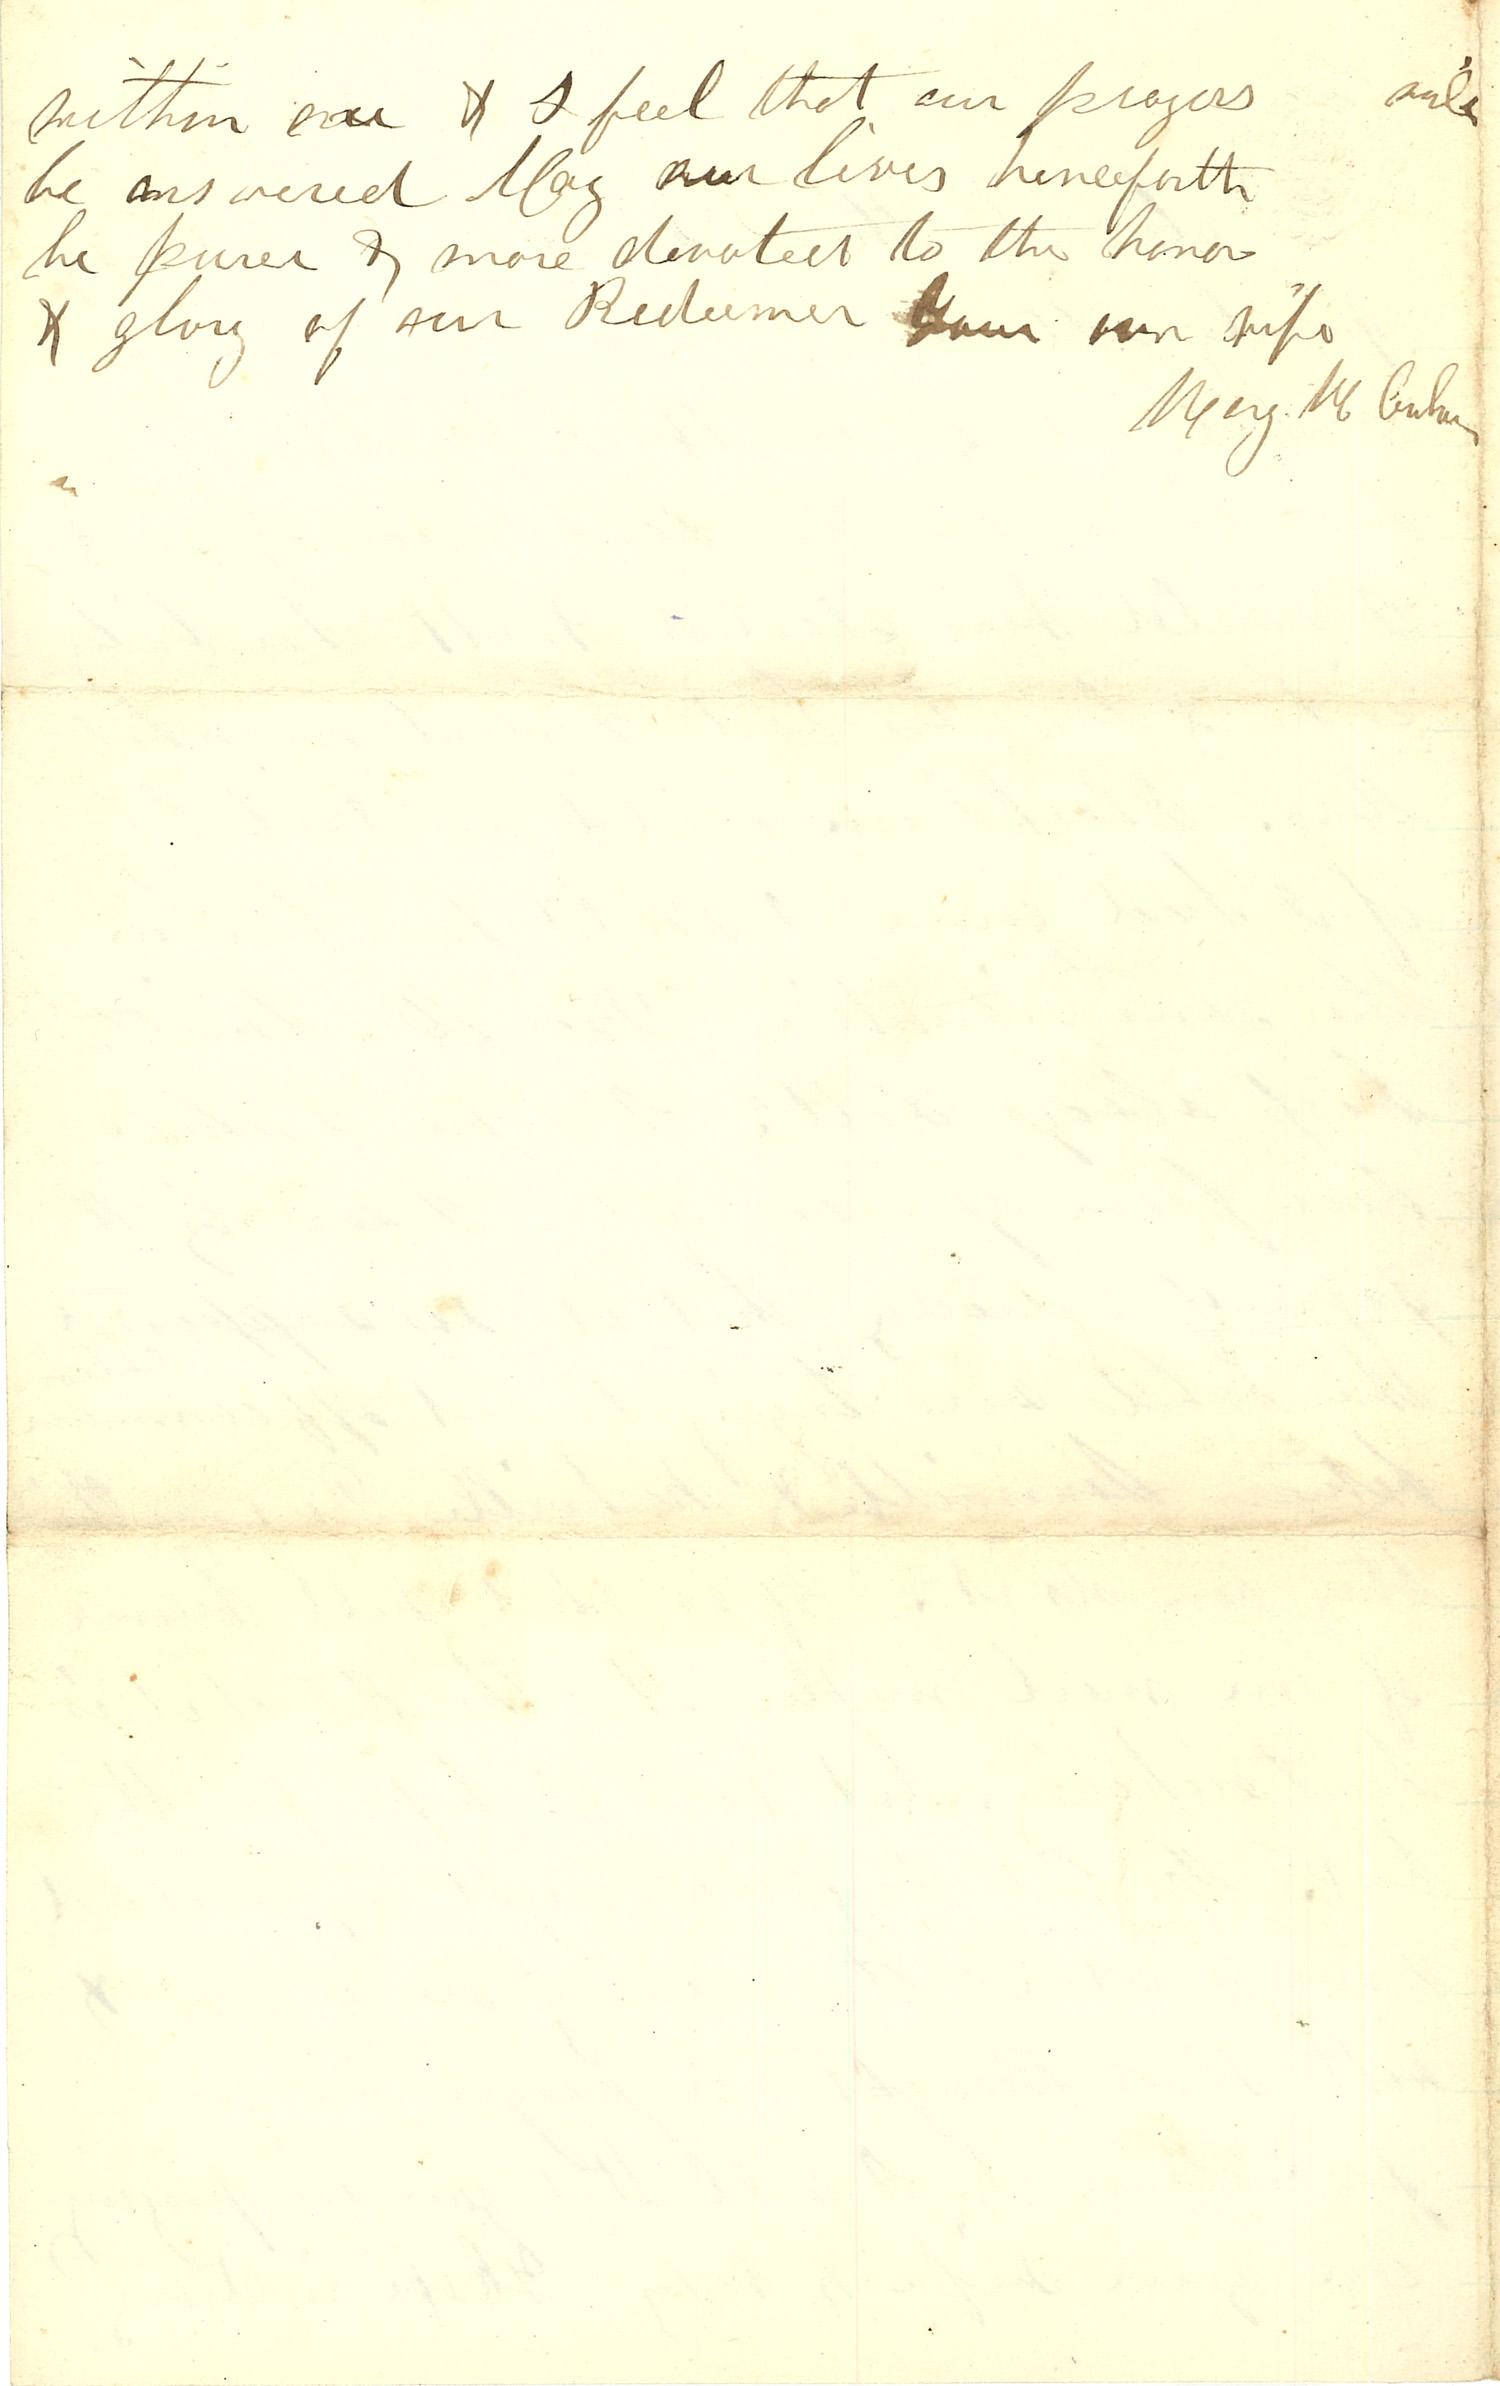 Joseph Culver Letter, December 27, 1862, Page 4